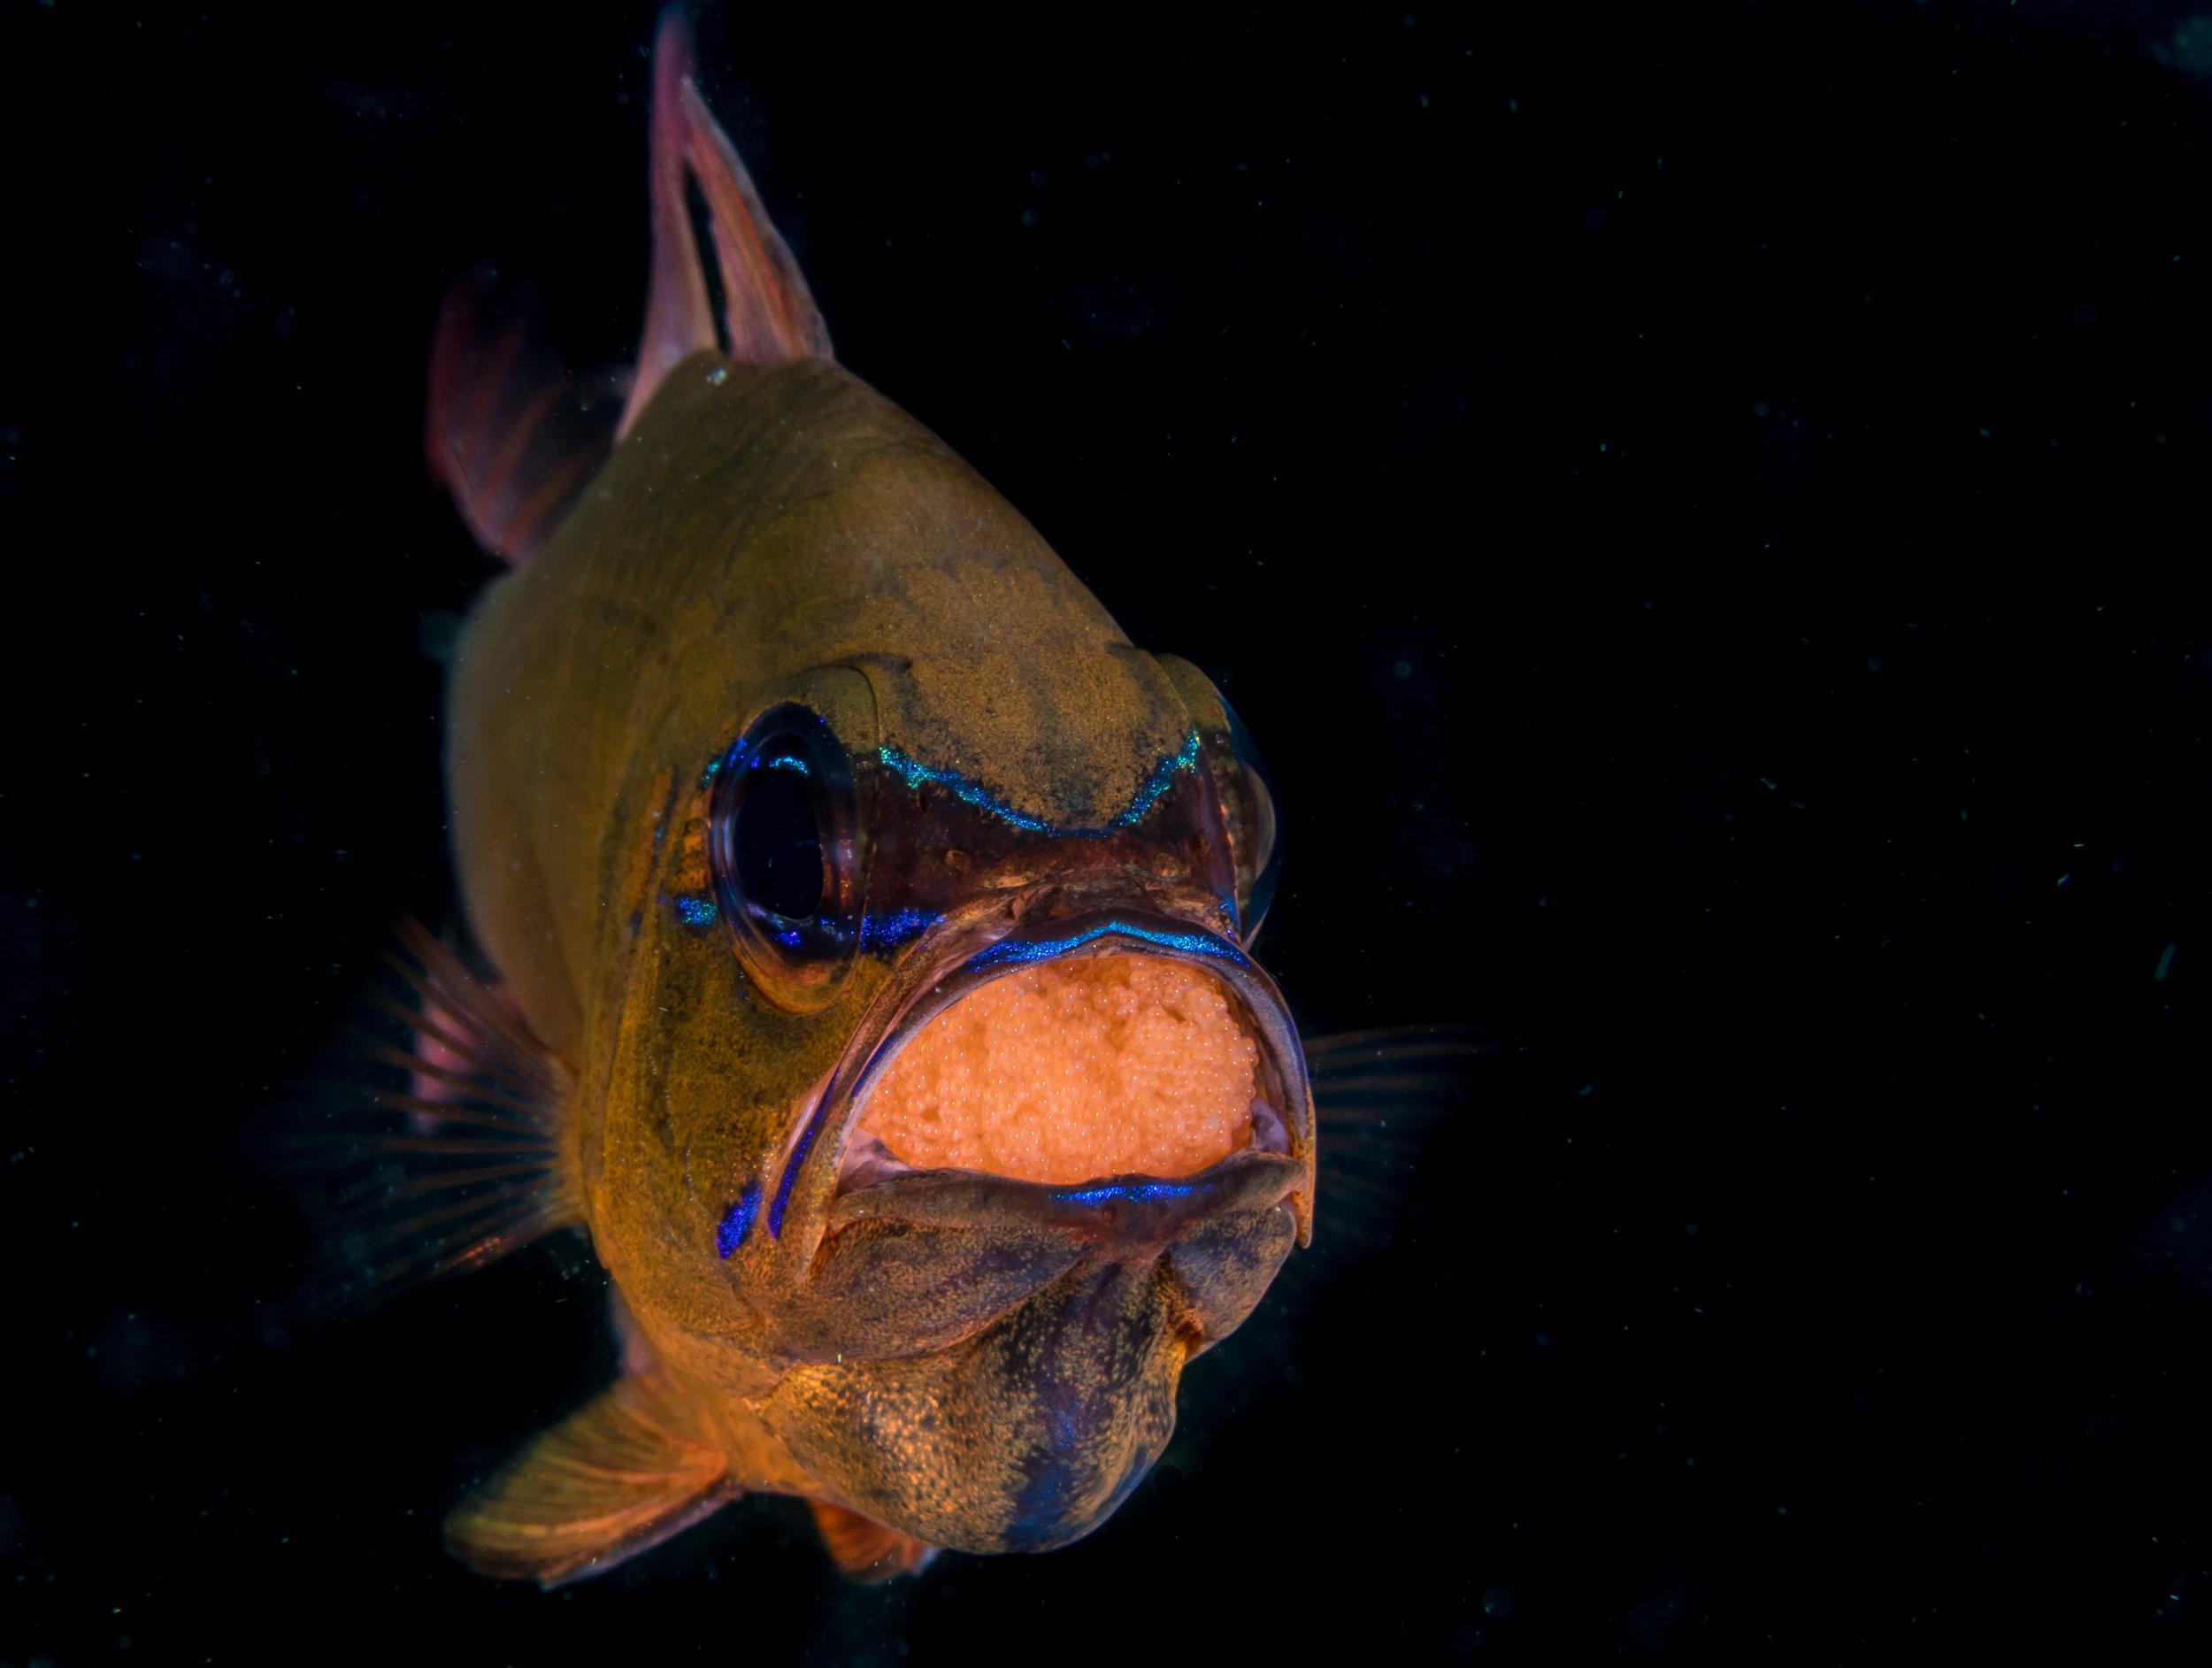 Cardinal Fish with Egg Brood